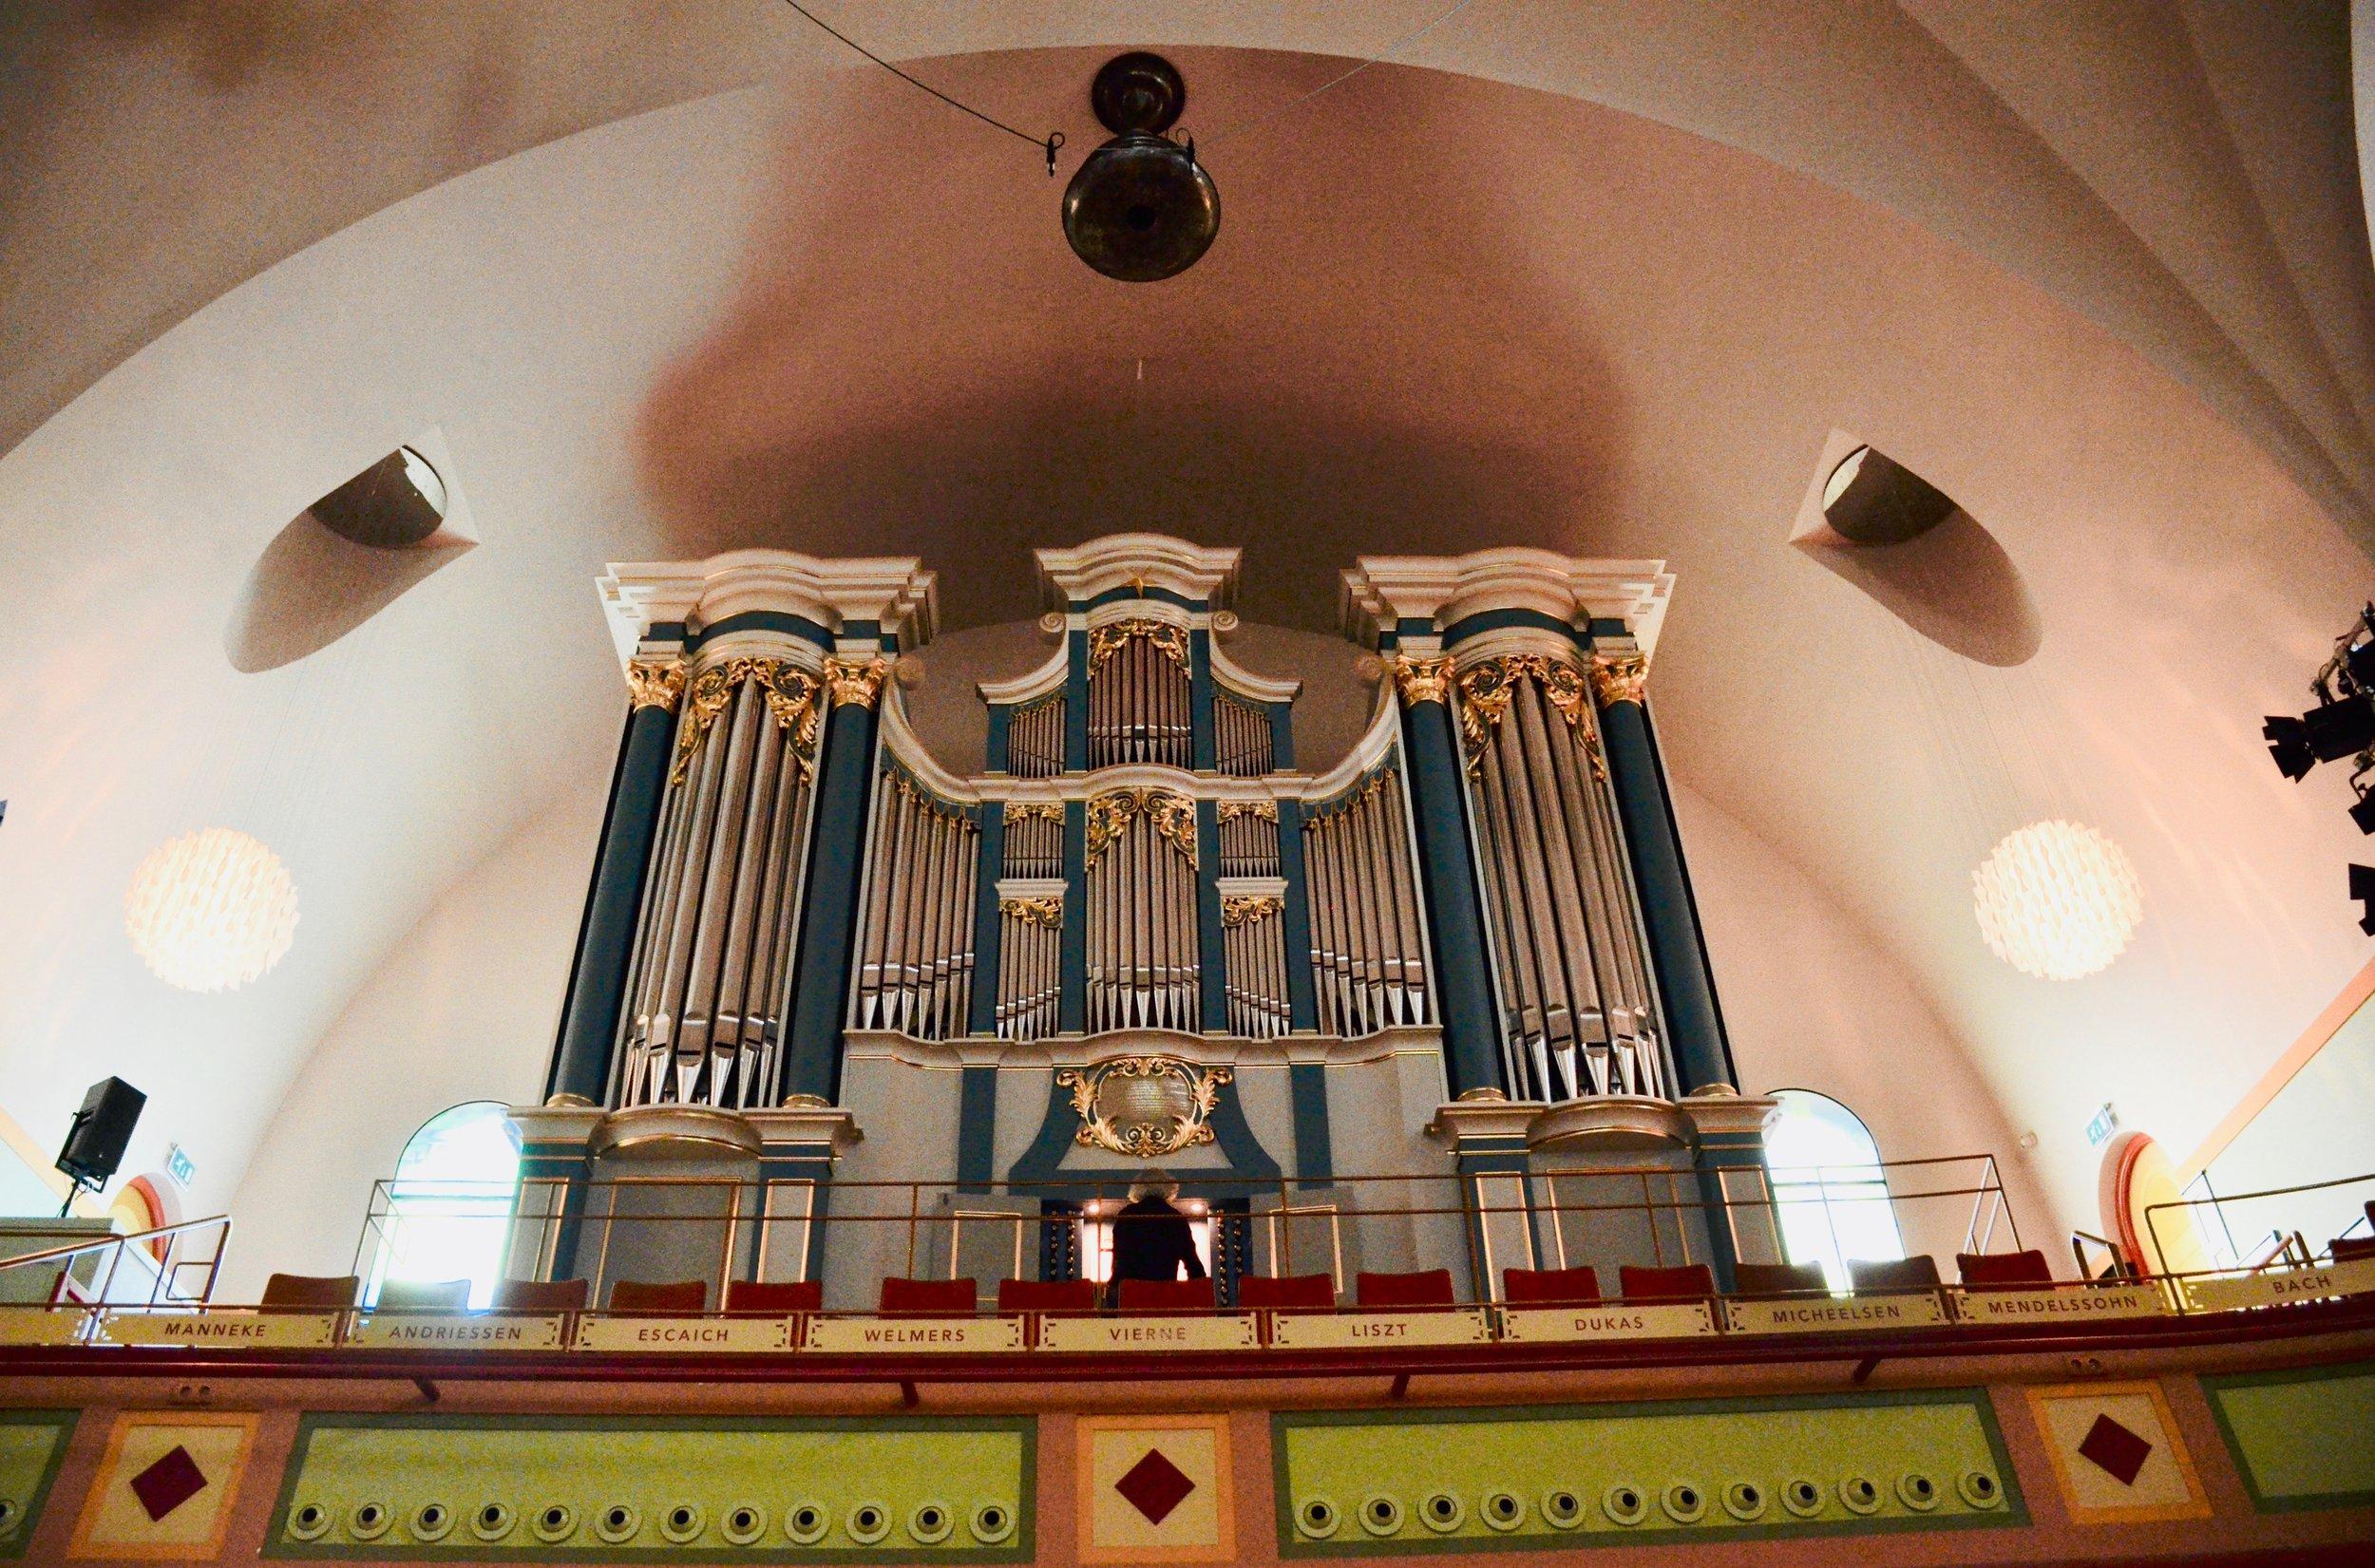 Hans Fidom demonstrates the new Utopa Baroque Organ at Orgelpark, Amsterdam. Boston Organ Studio.